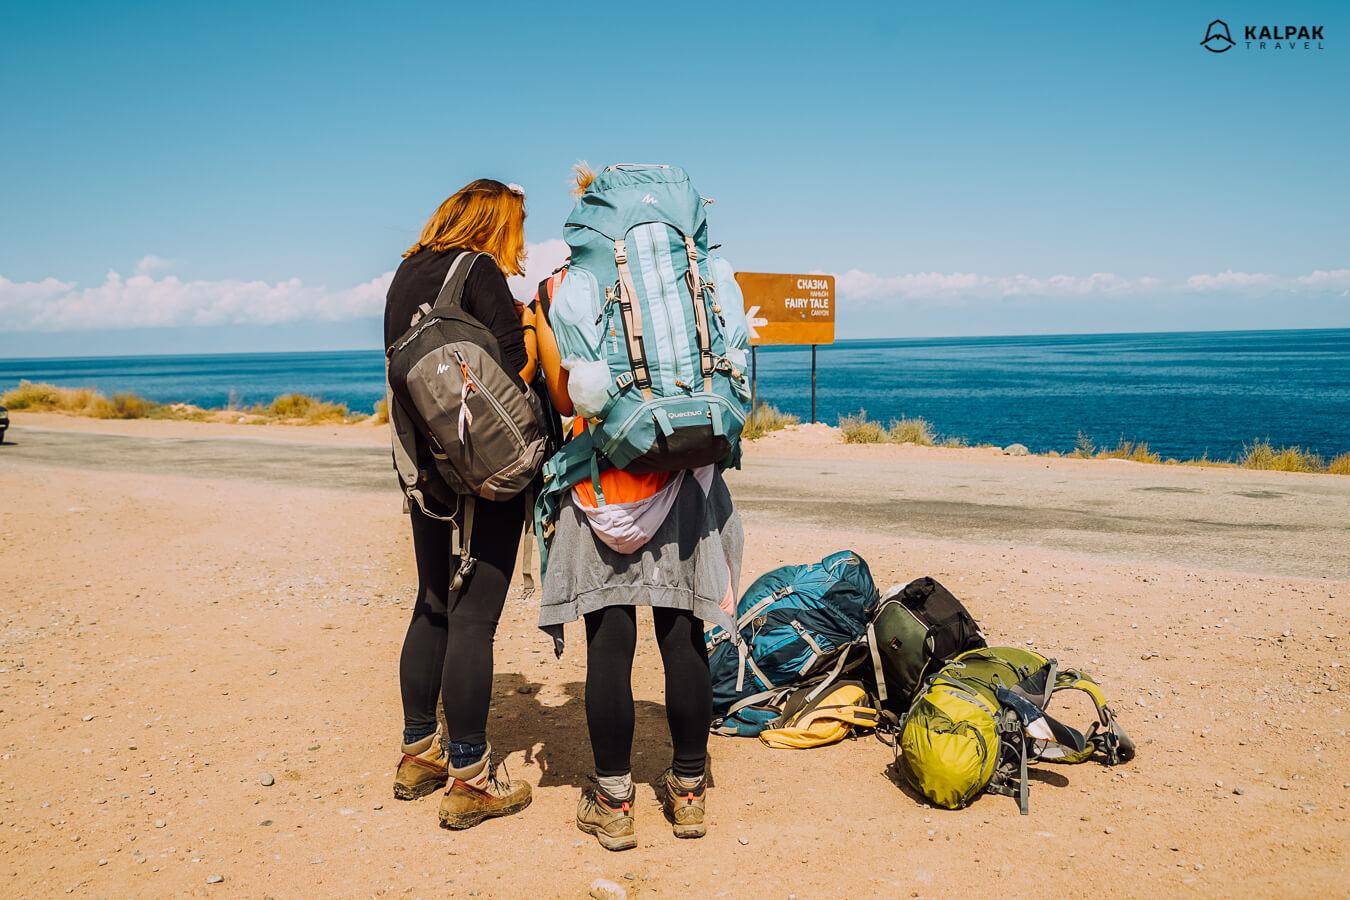 Trekking in Central Asia